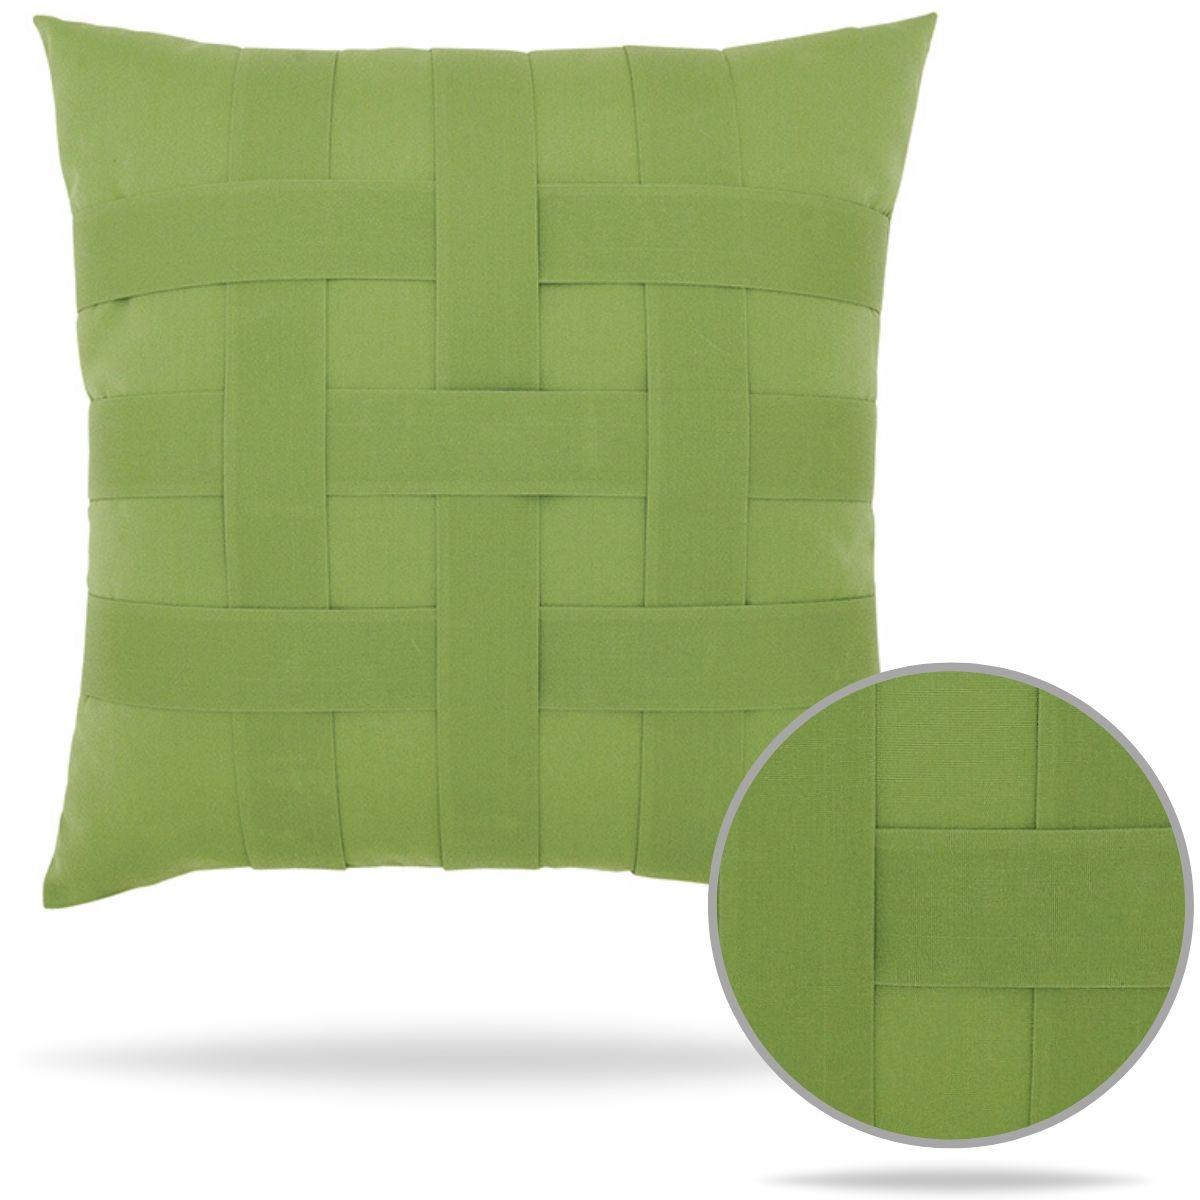 basketweave-ginko-elaine-smith-nd12 outdoor pillow